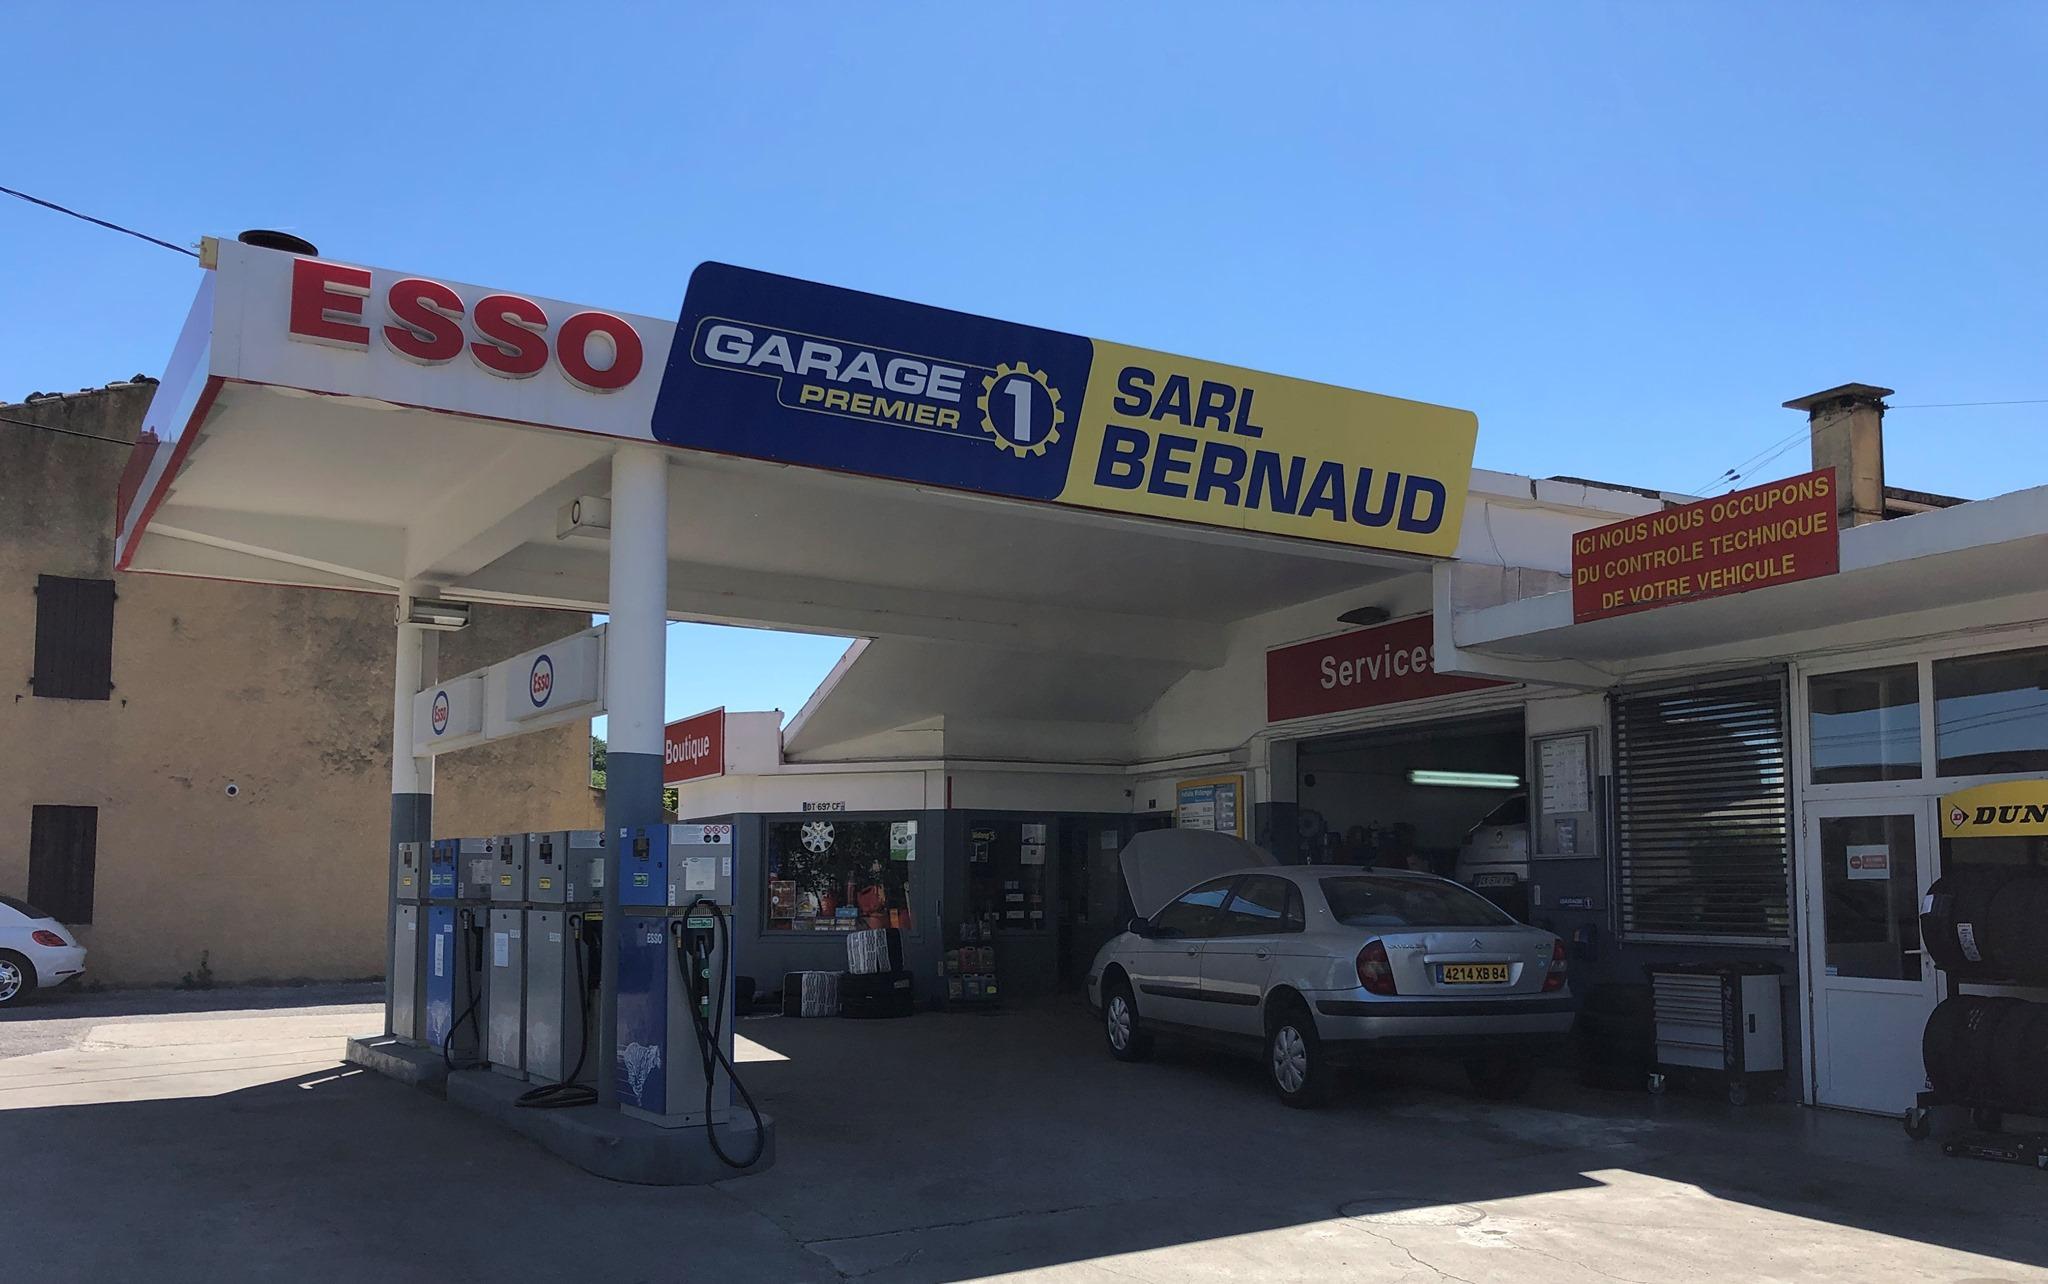 STATION ESSO Garage Bernaud Remy